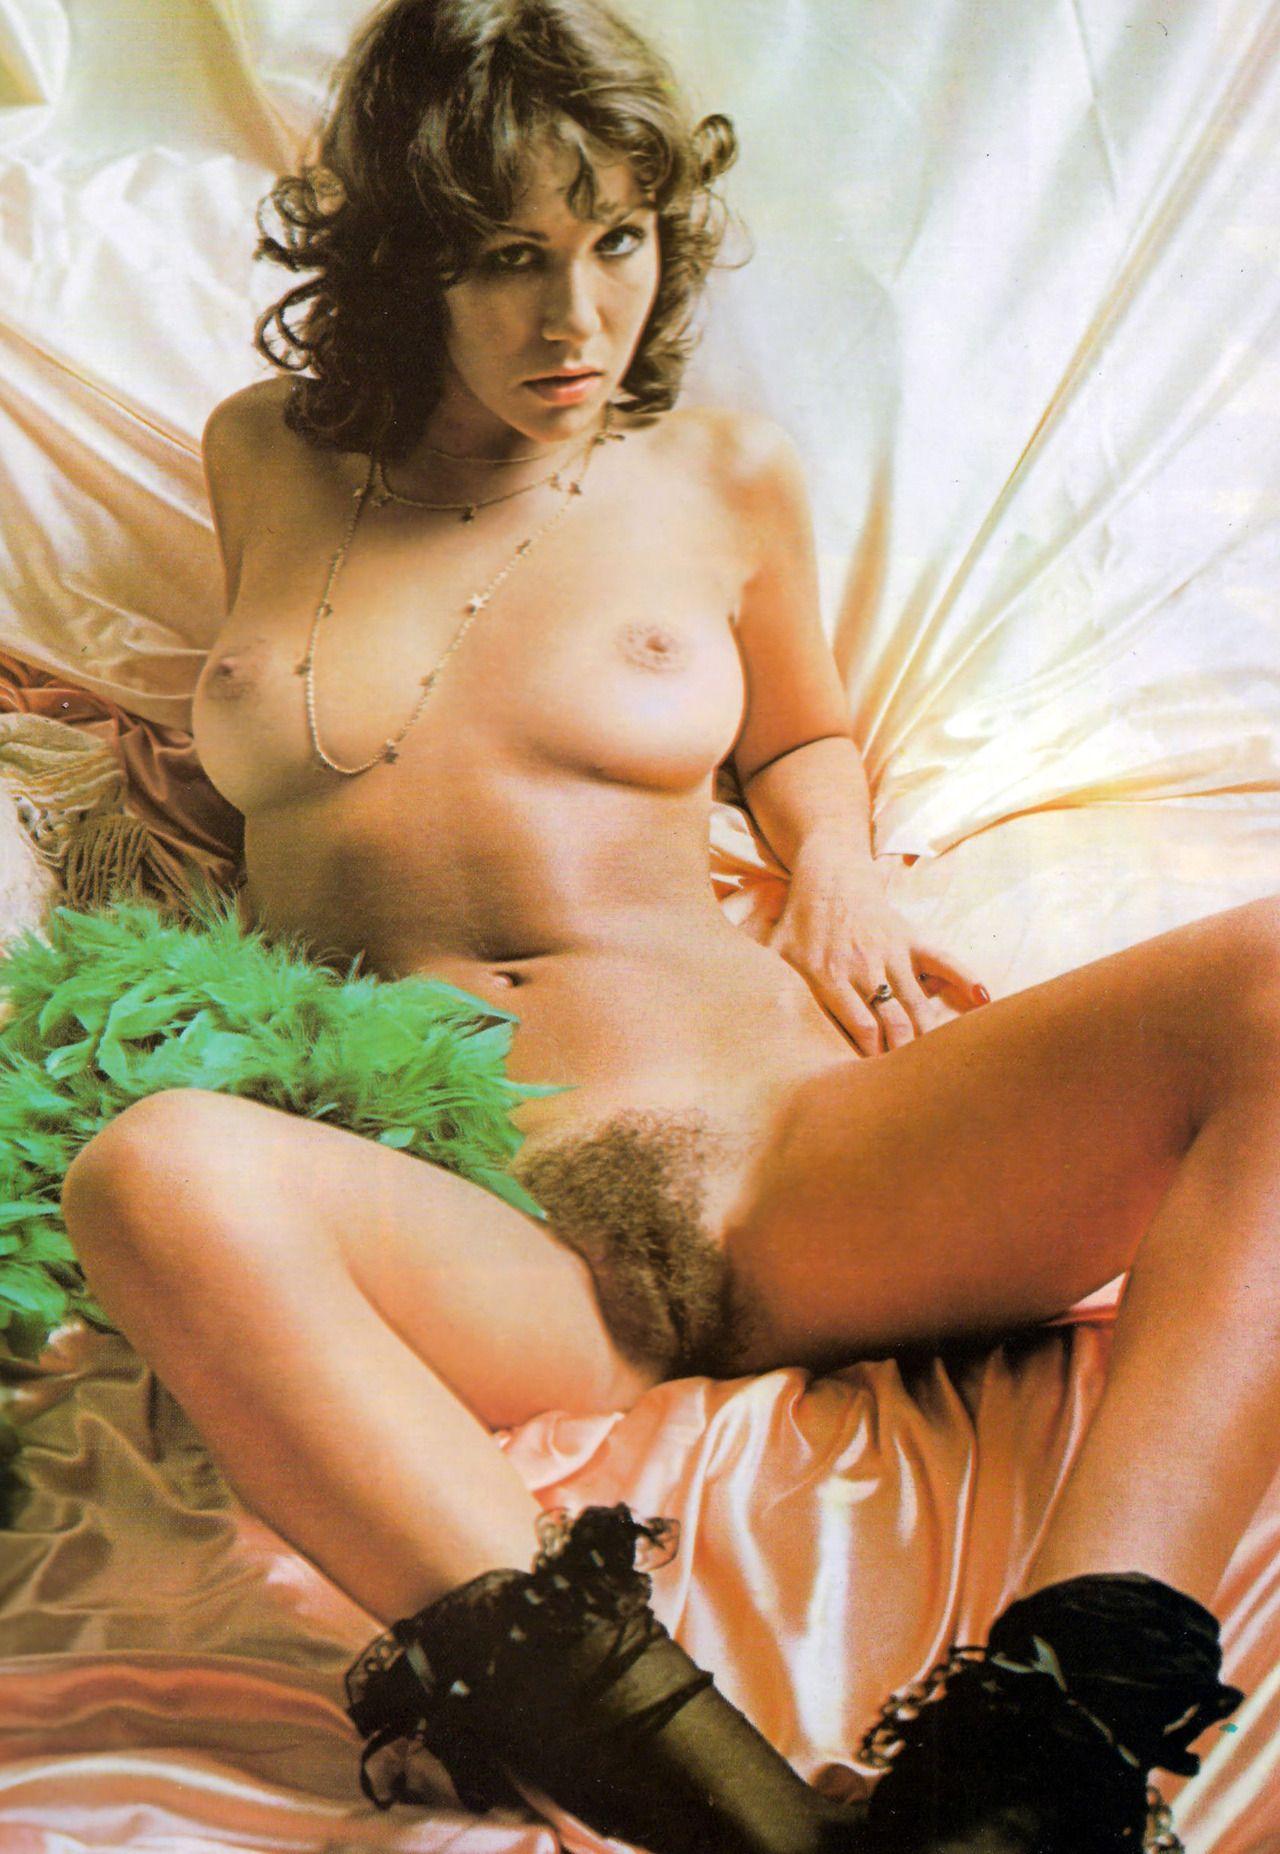 Linda lusardi nude and fucked, cum kisses bisexual couple gifs